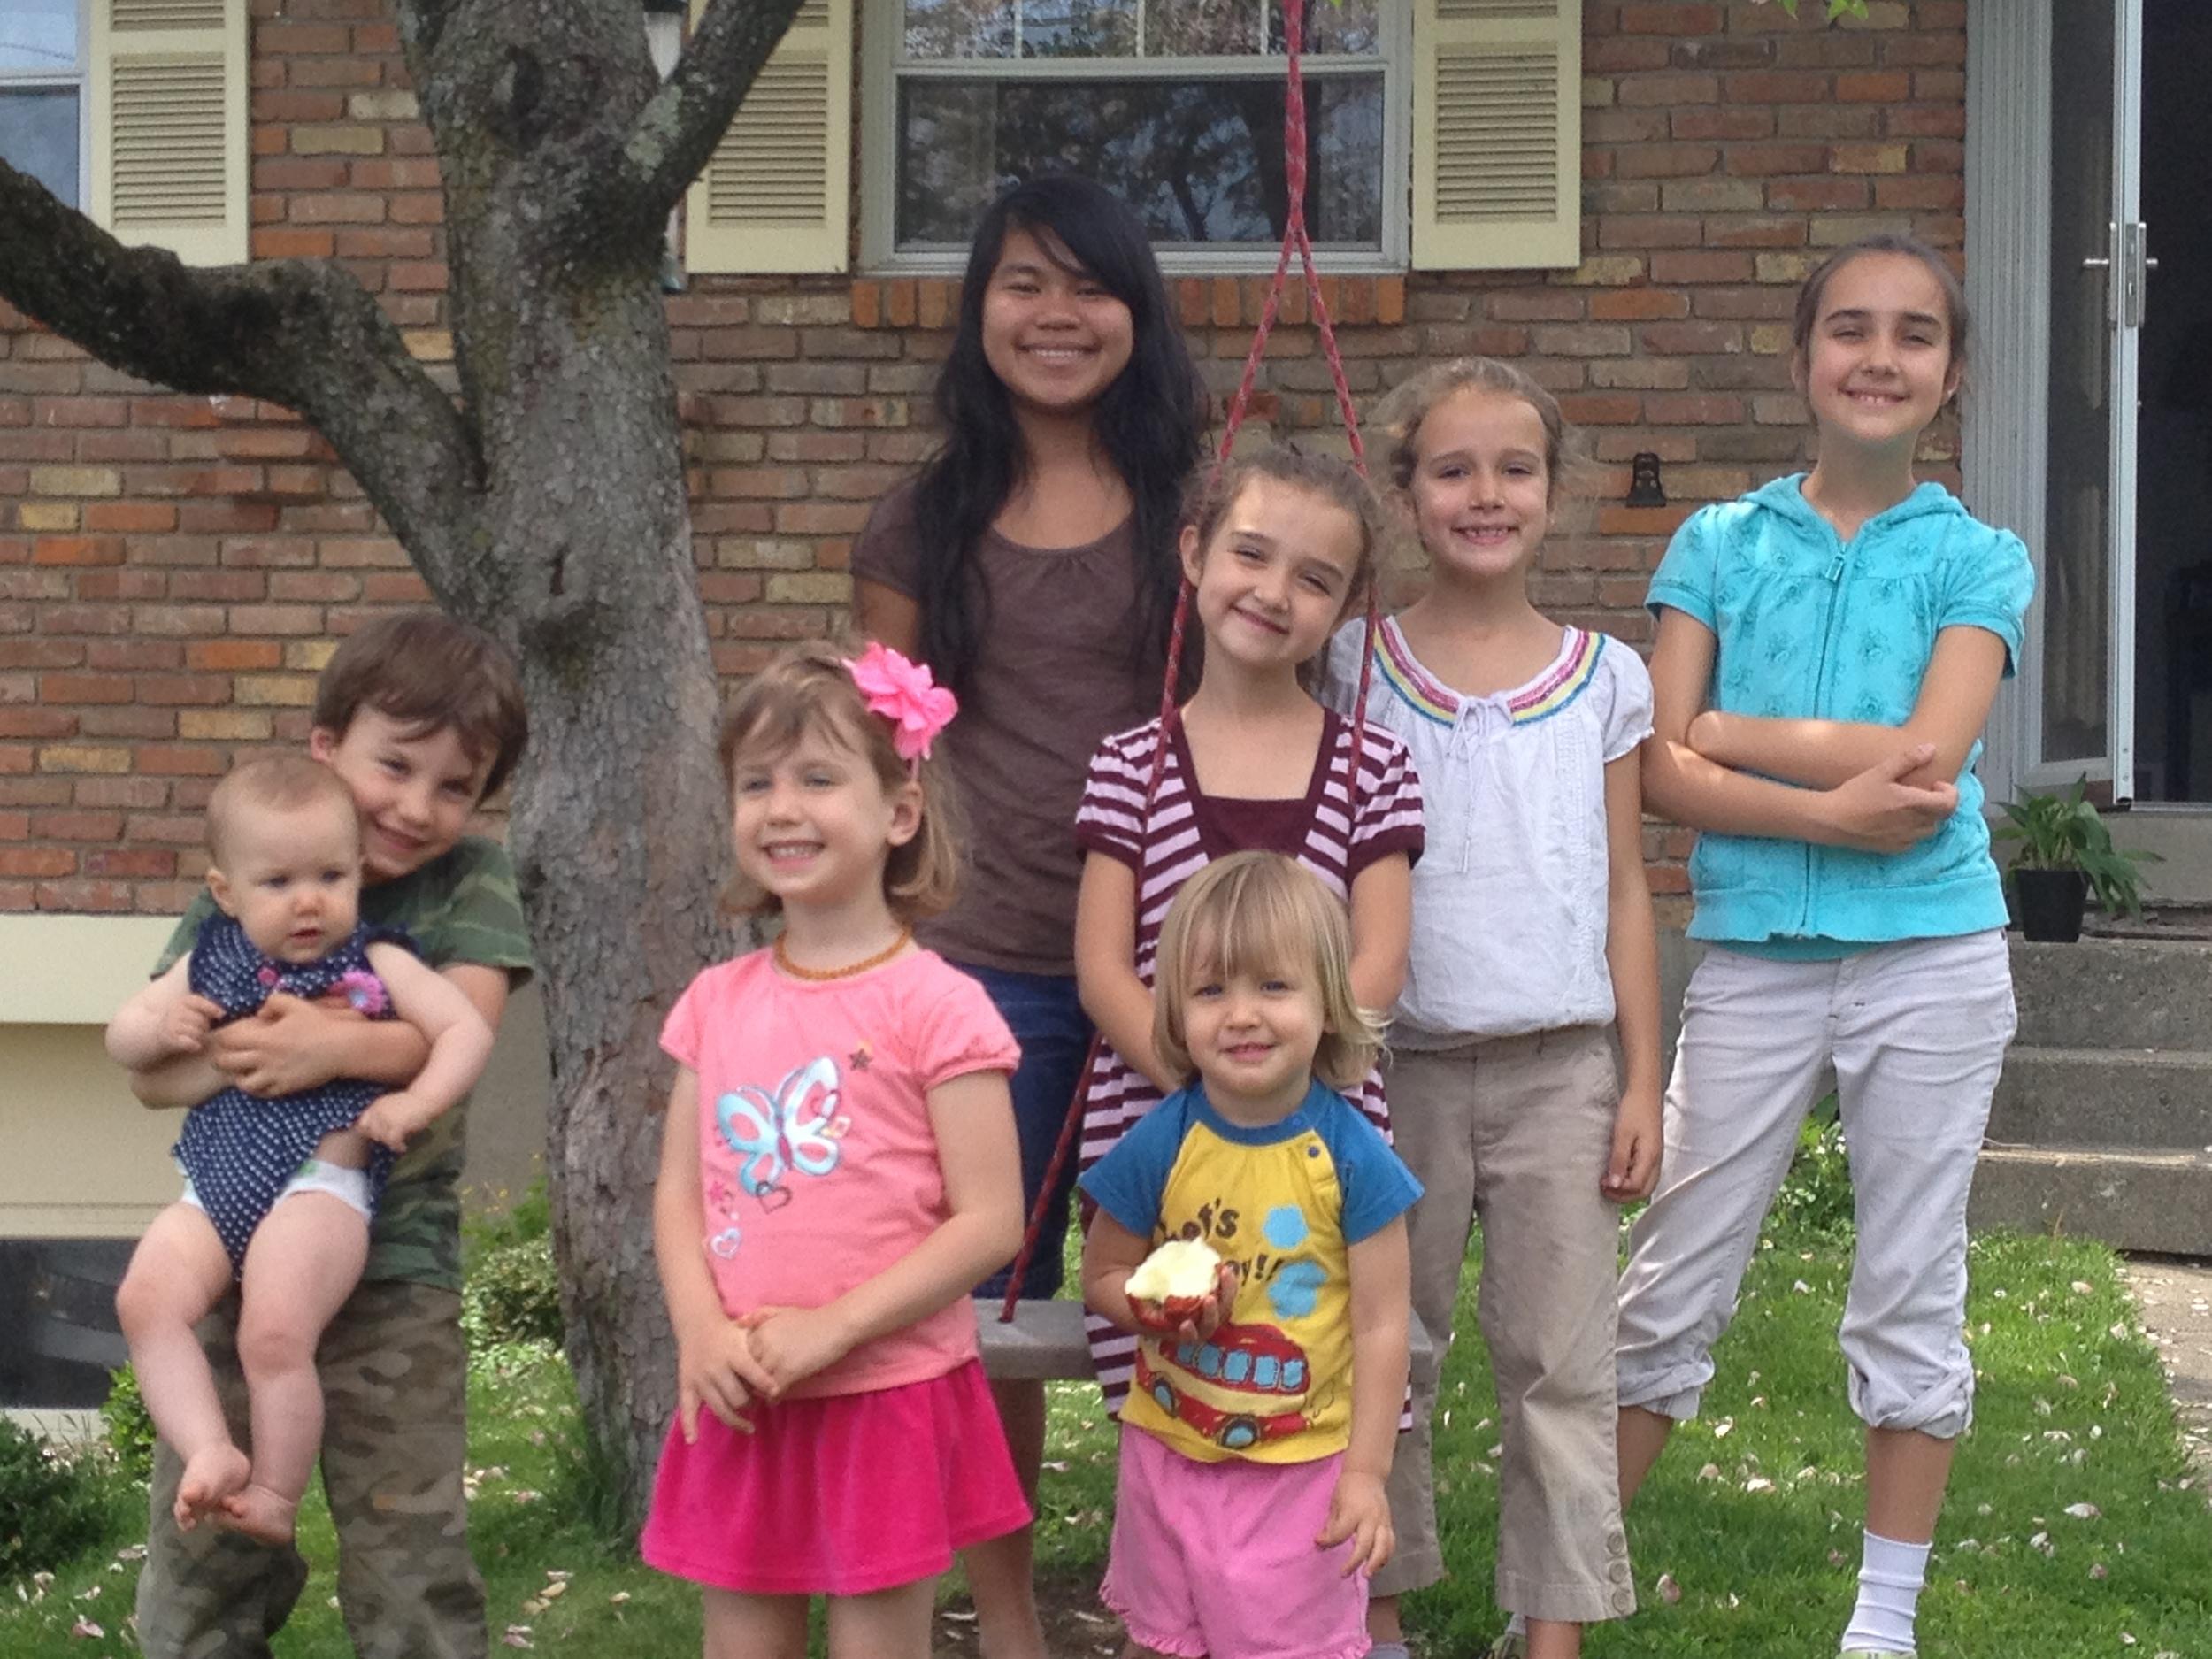 The Oshman kids and the Smith kids in Cincinnati.